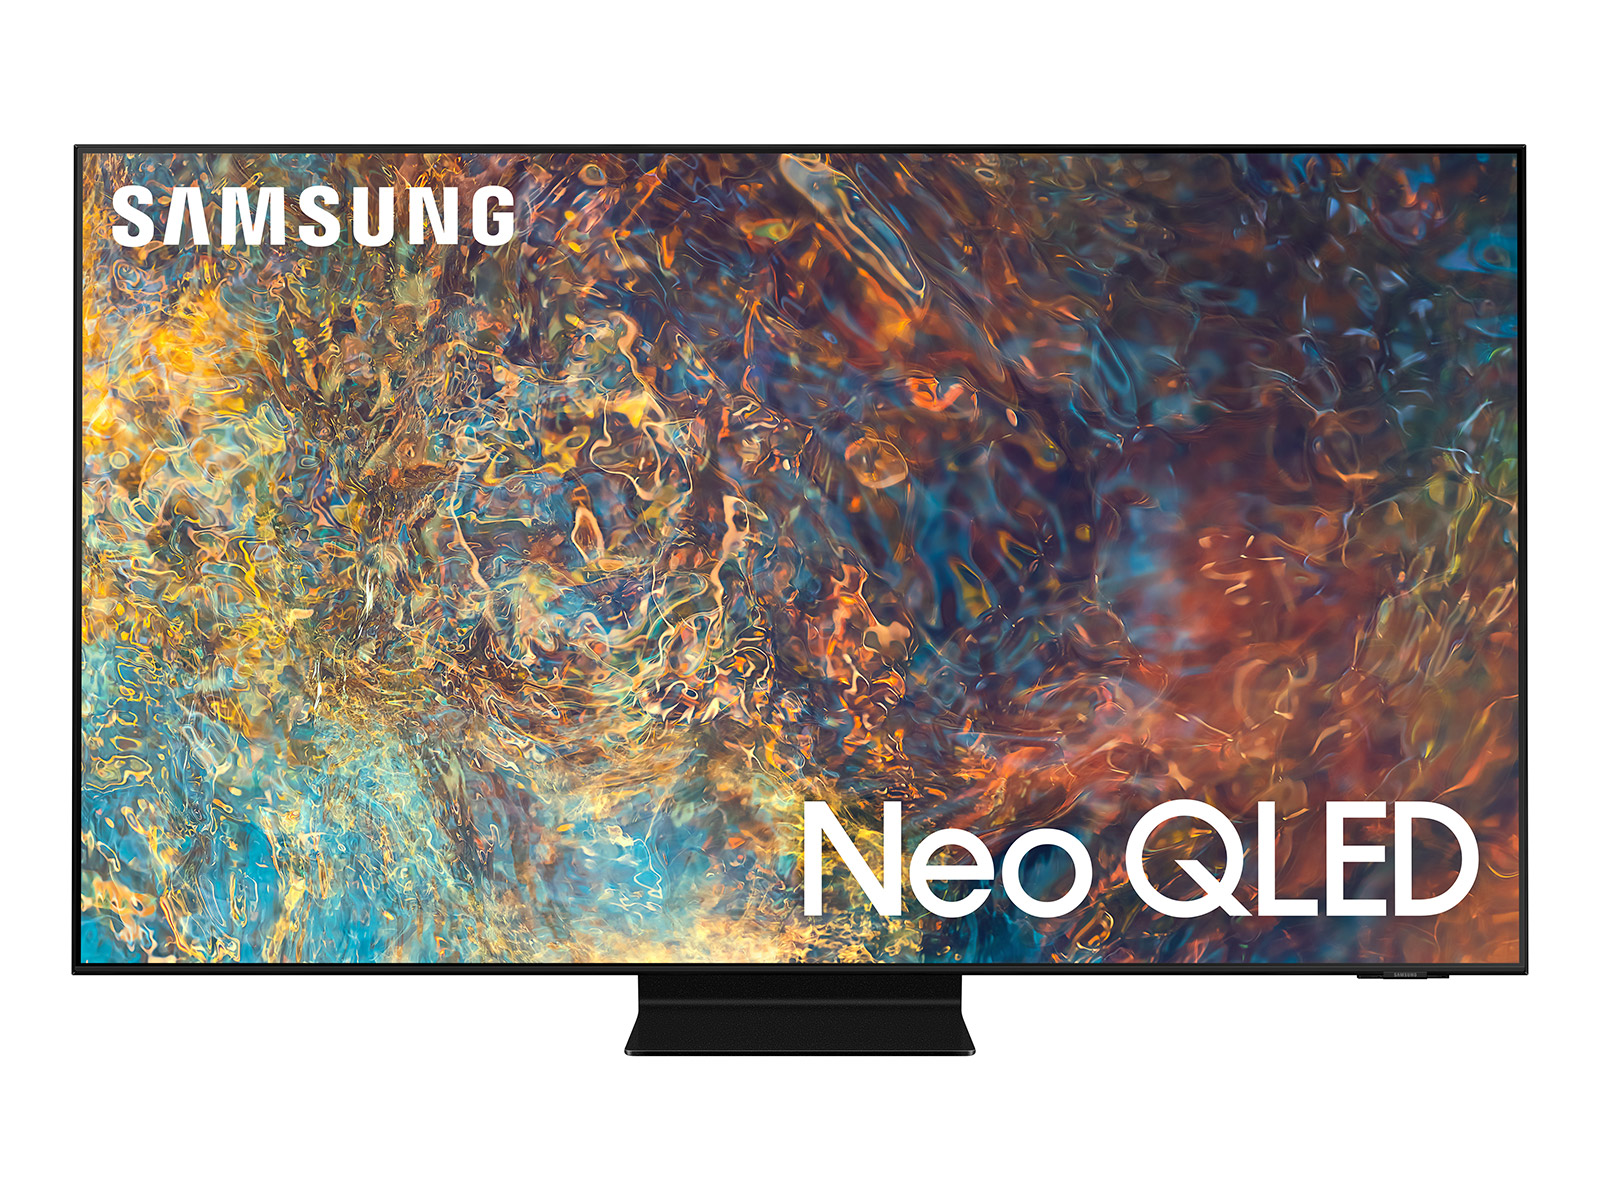 Samsung 65 QN90A Neo QLED 4K Smart TV, QN65QN90AAFXZA, 2021